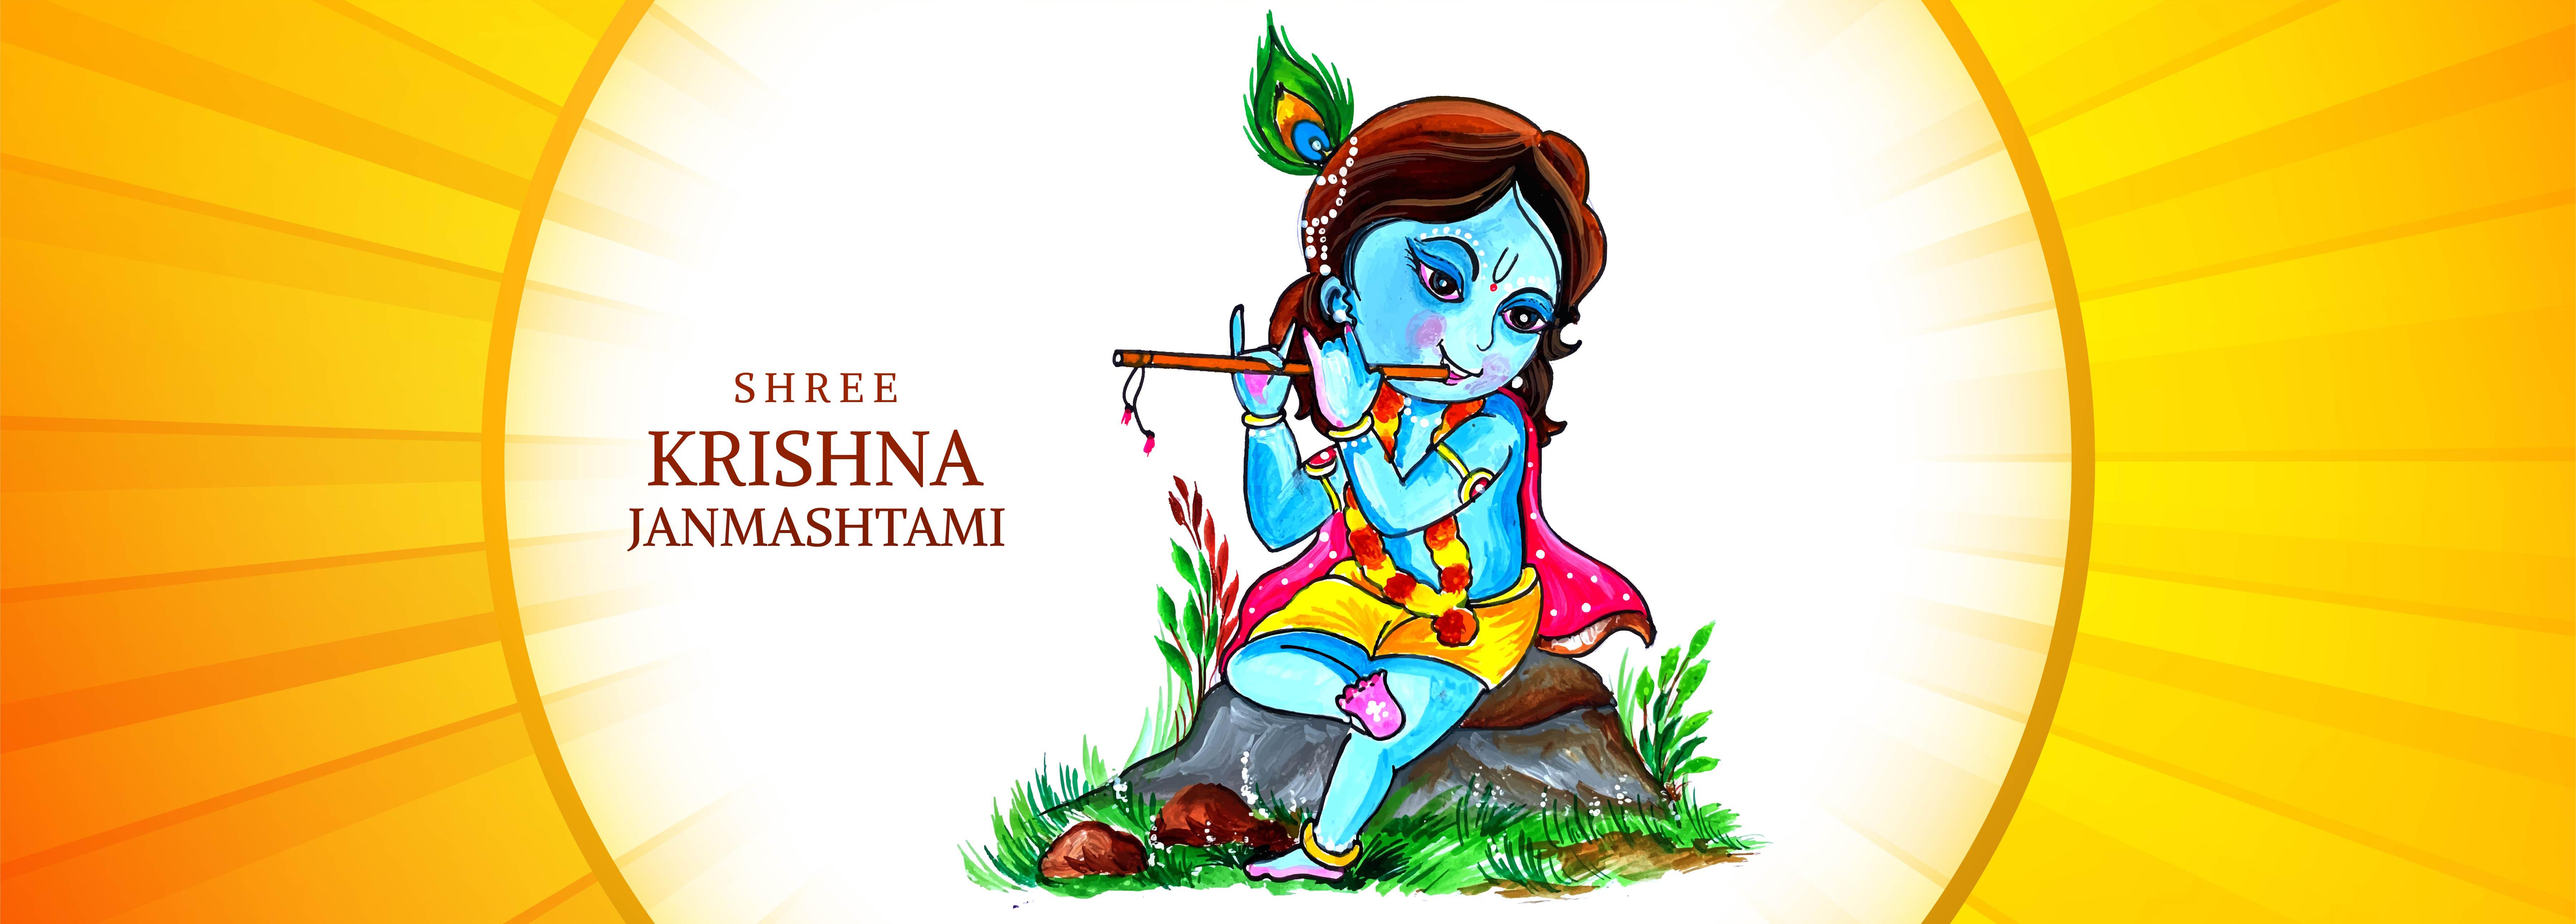 Happy Krishna on Rock Playing Flute Janmashtami Festival Banner